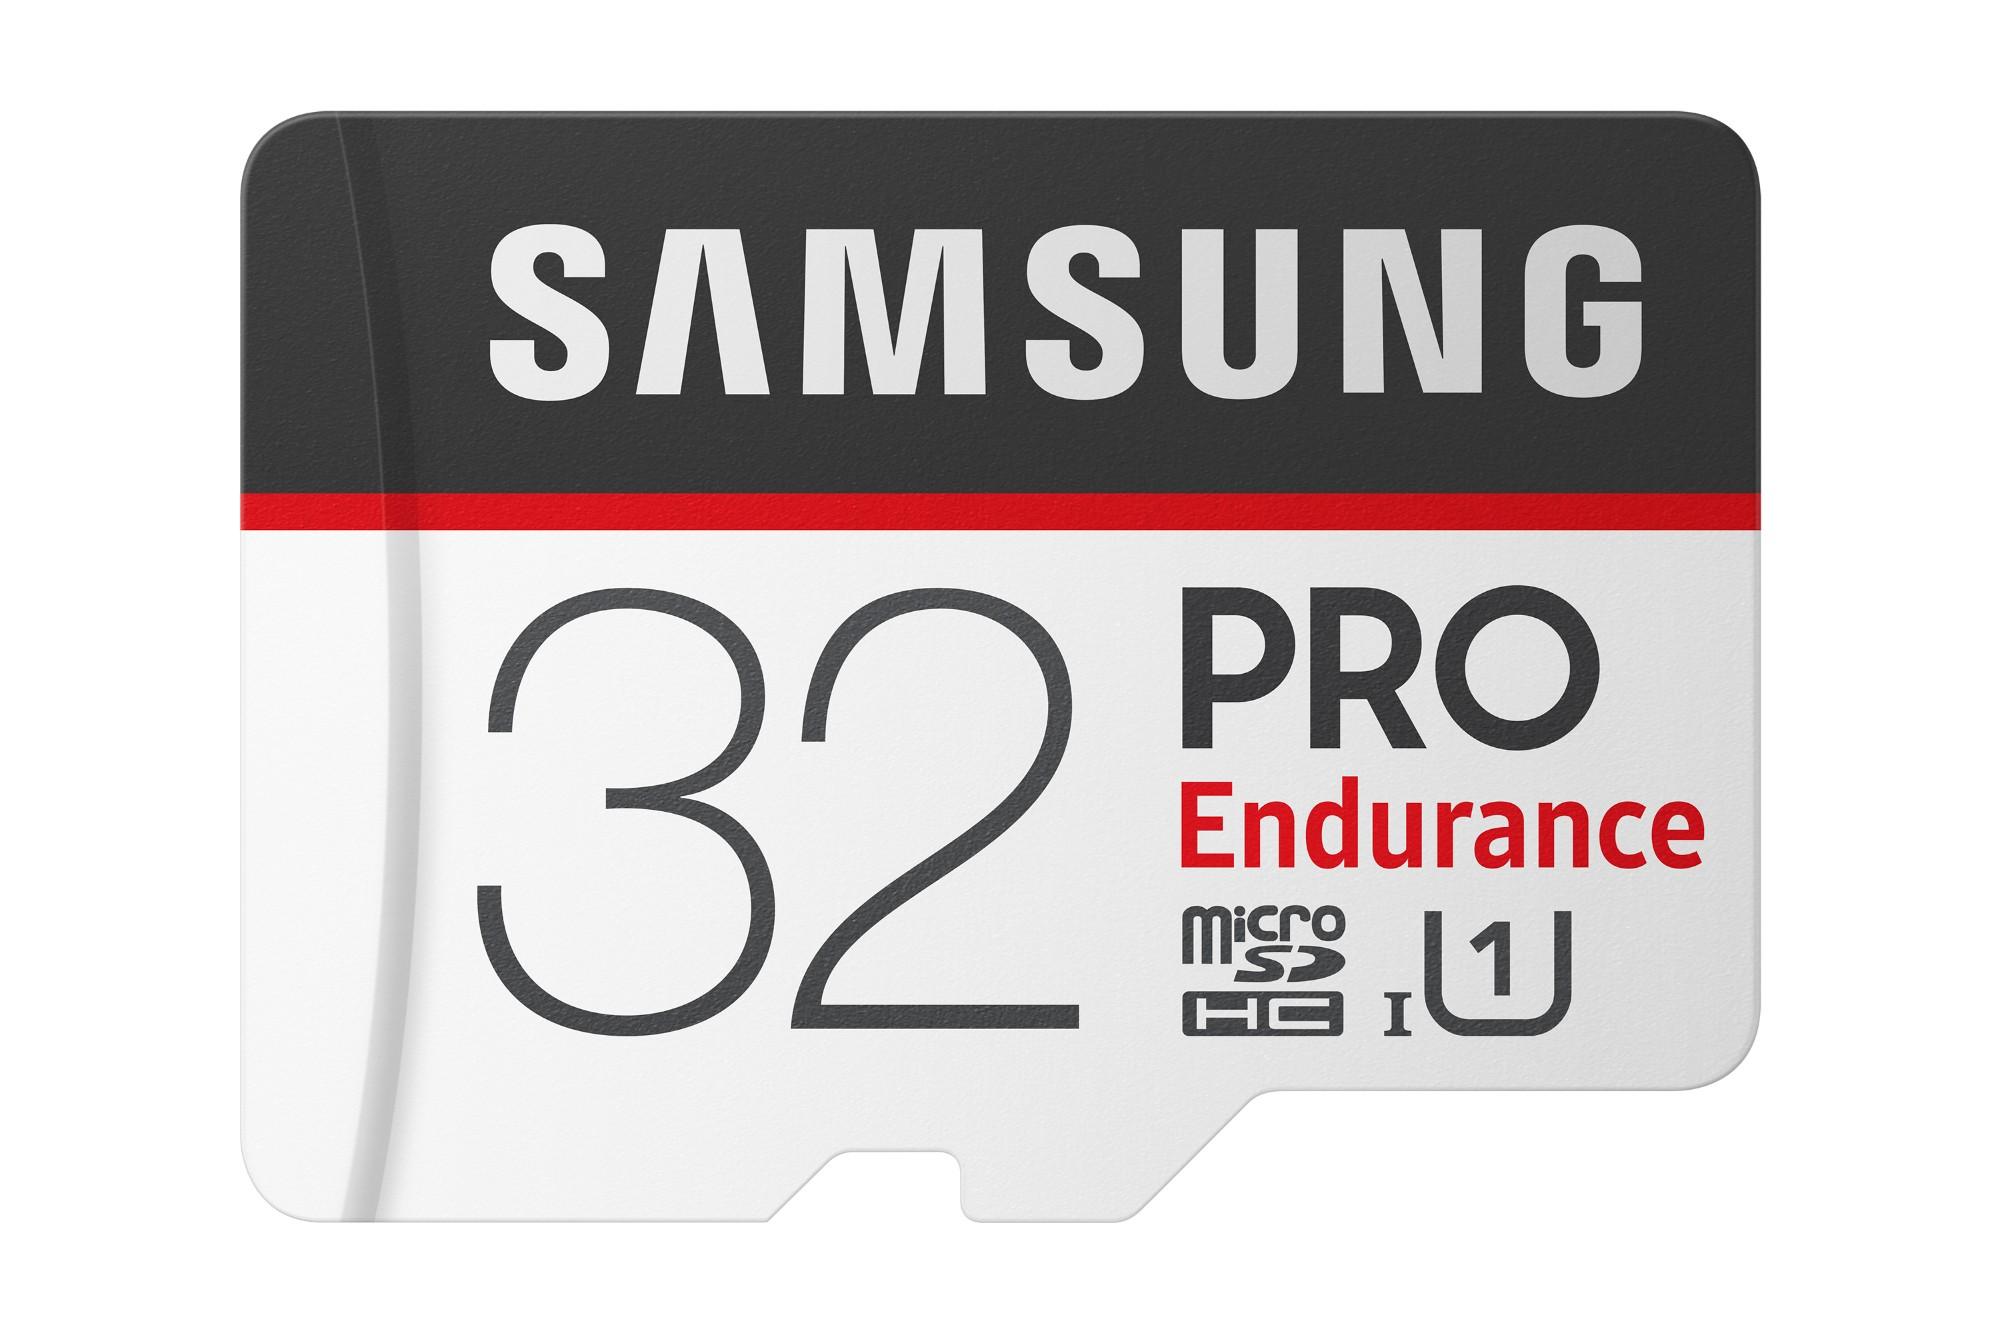 Micro Sdhc Pro Endurance 32gb